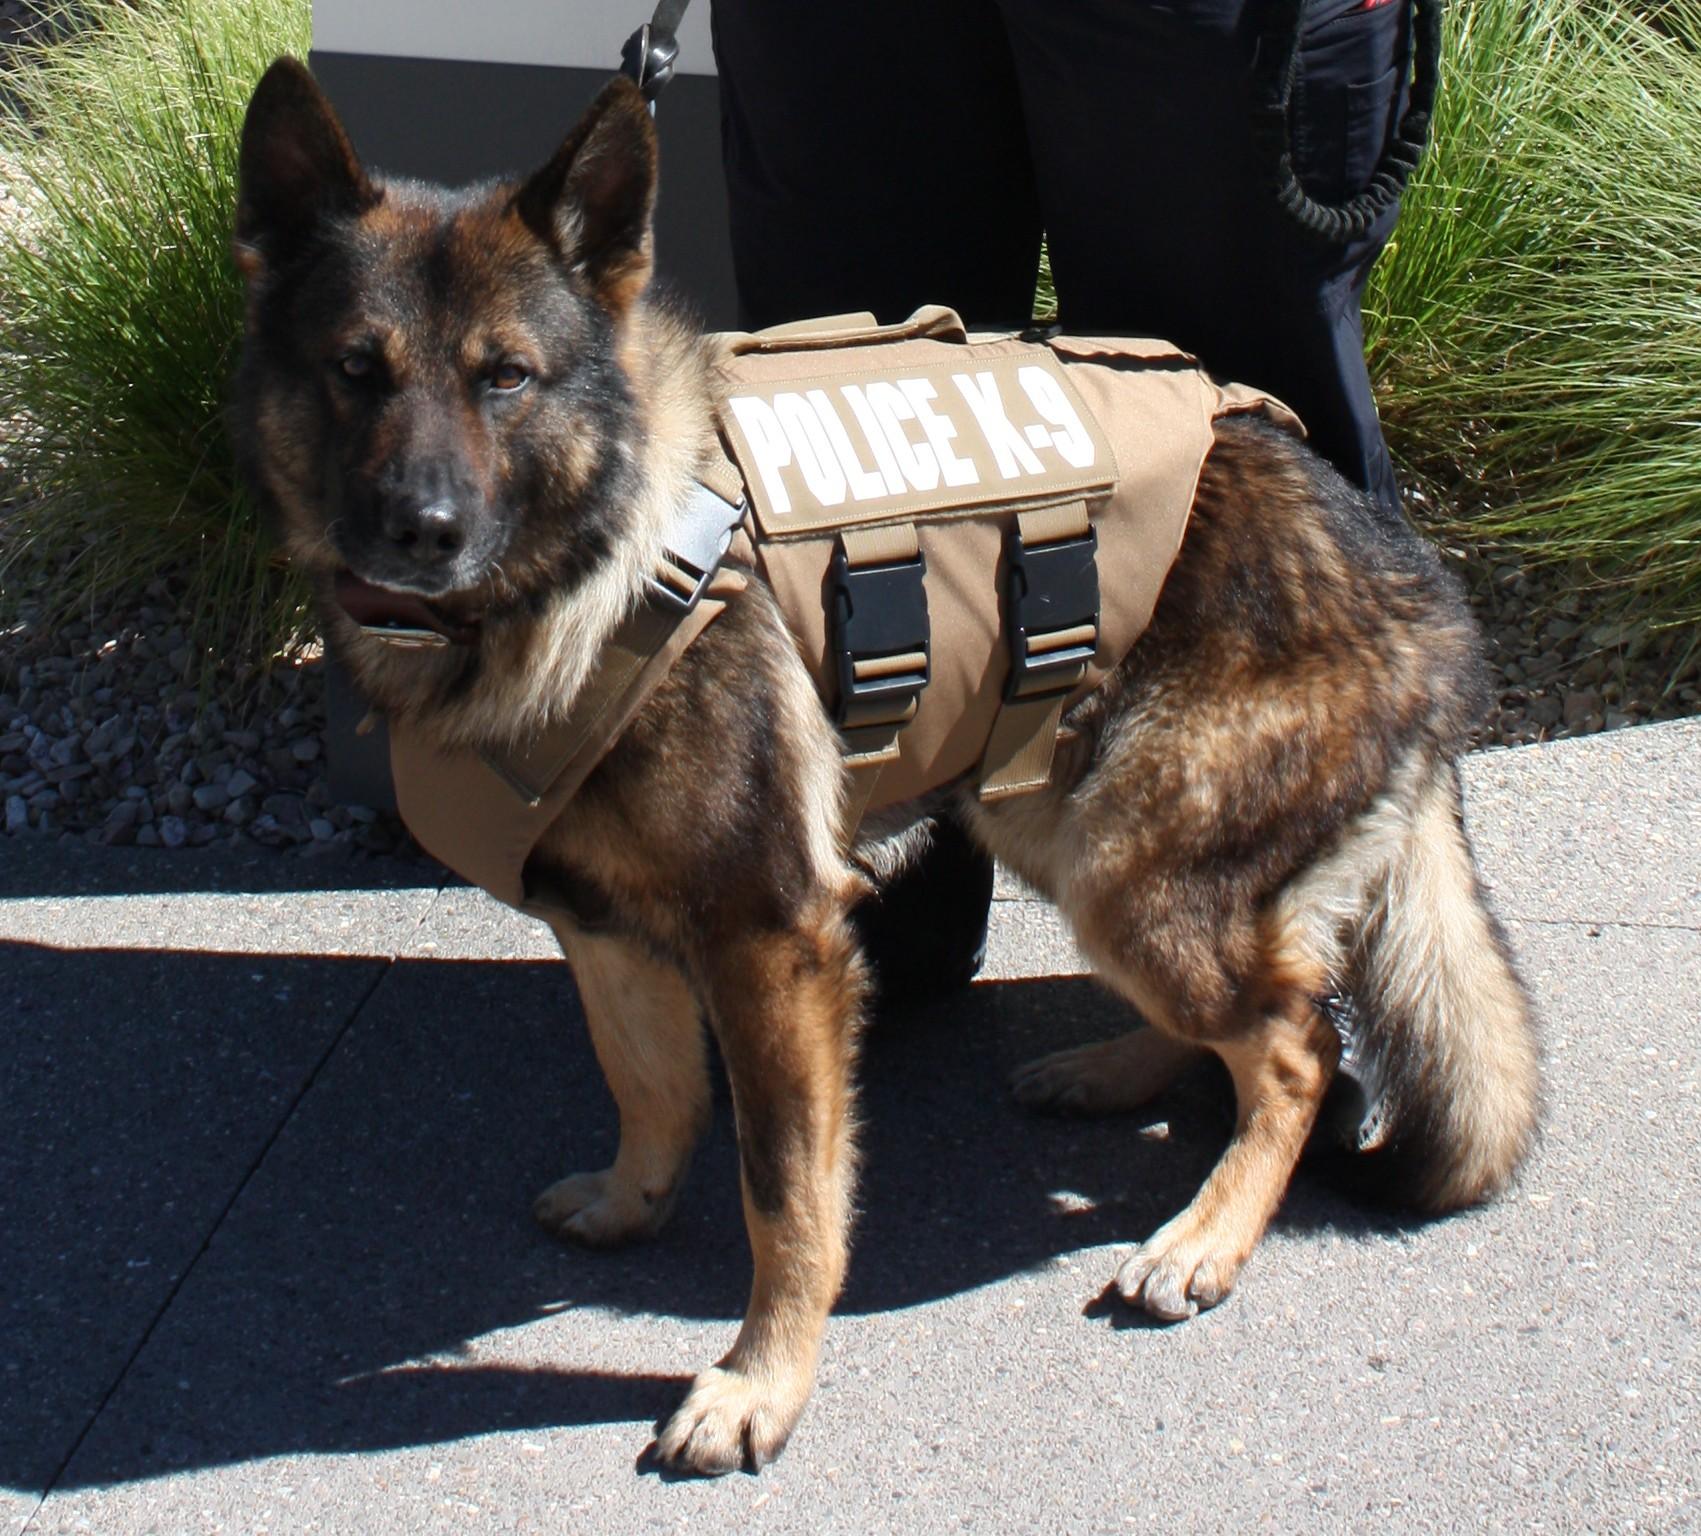 Gjpd k9 receives new ballistic vest gvcopbeat gjco the for Ballistic dog